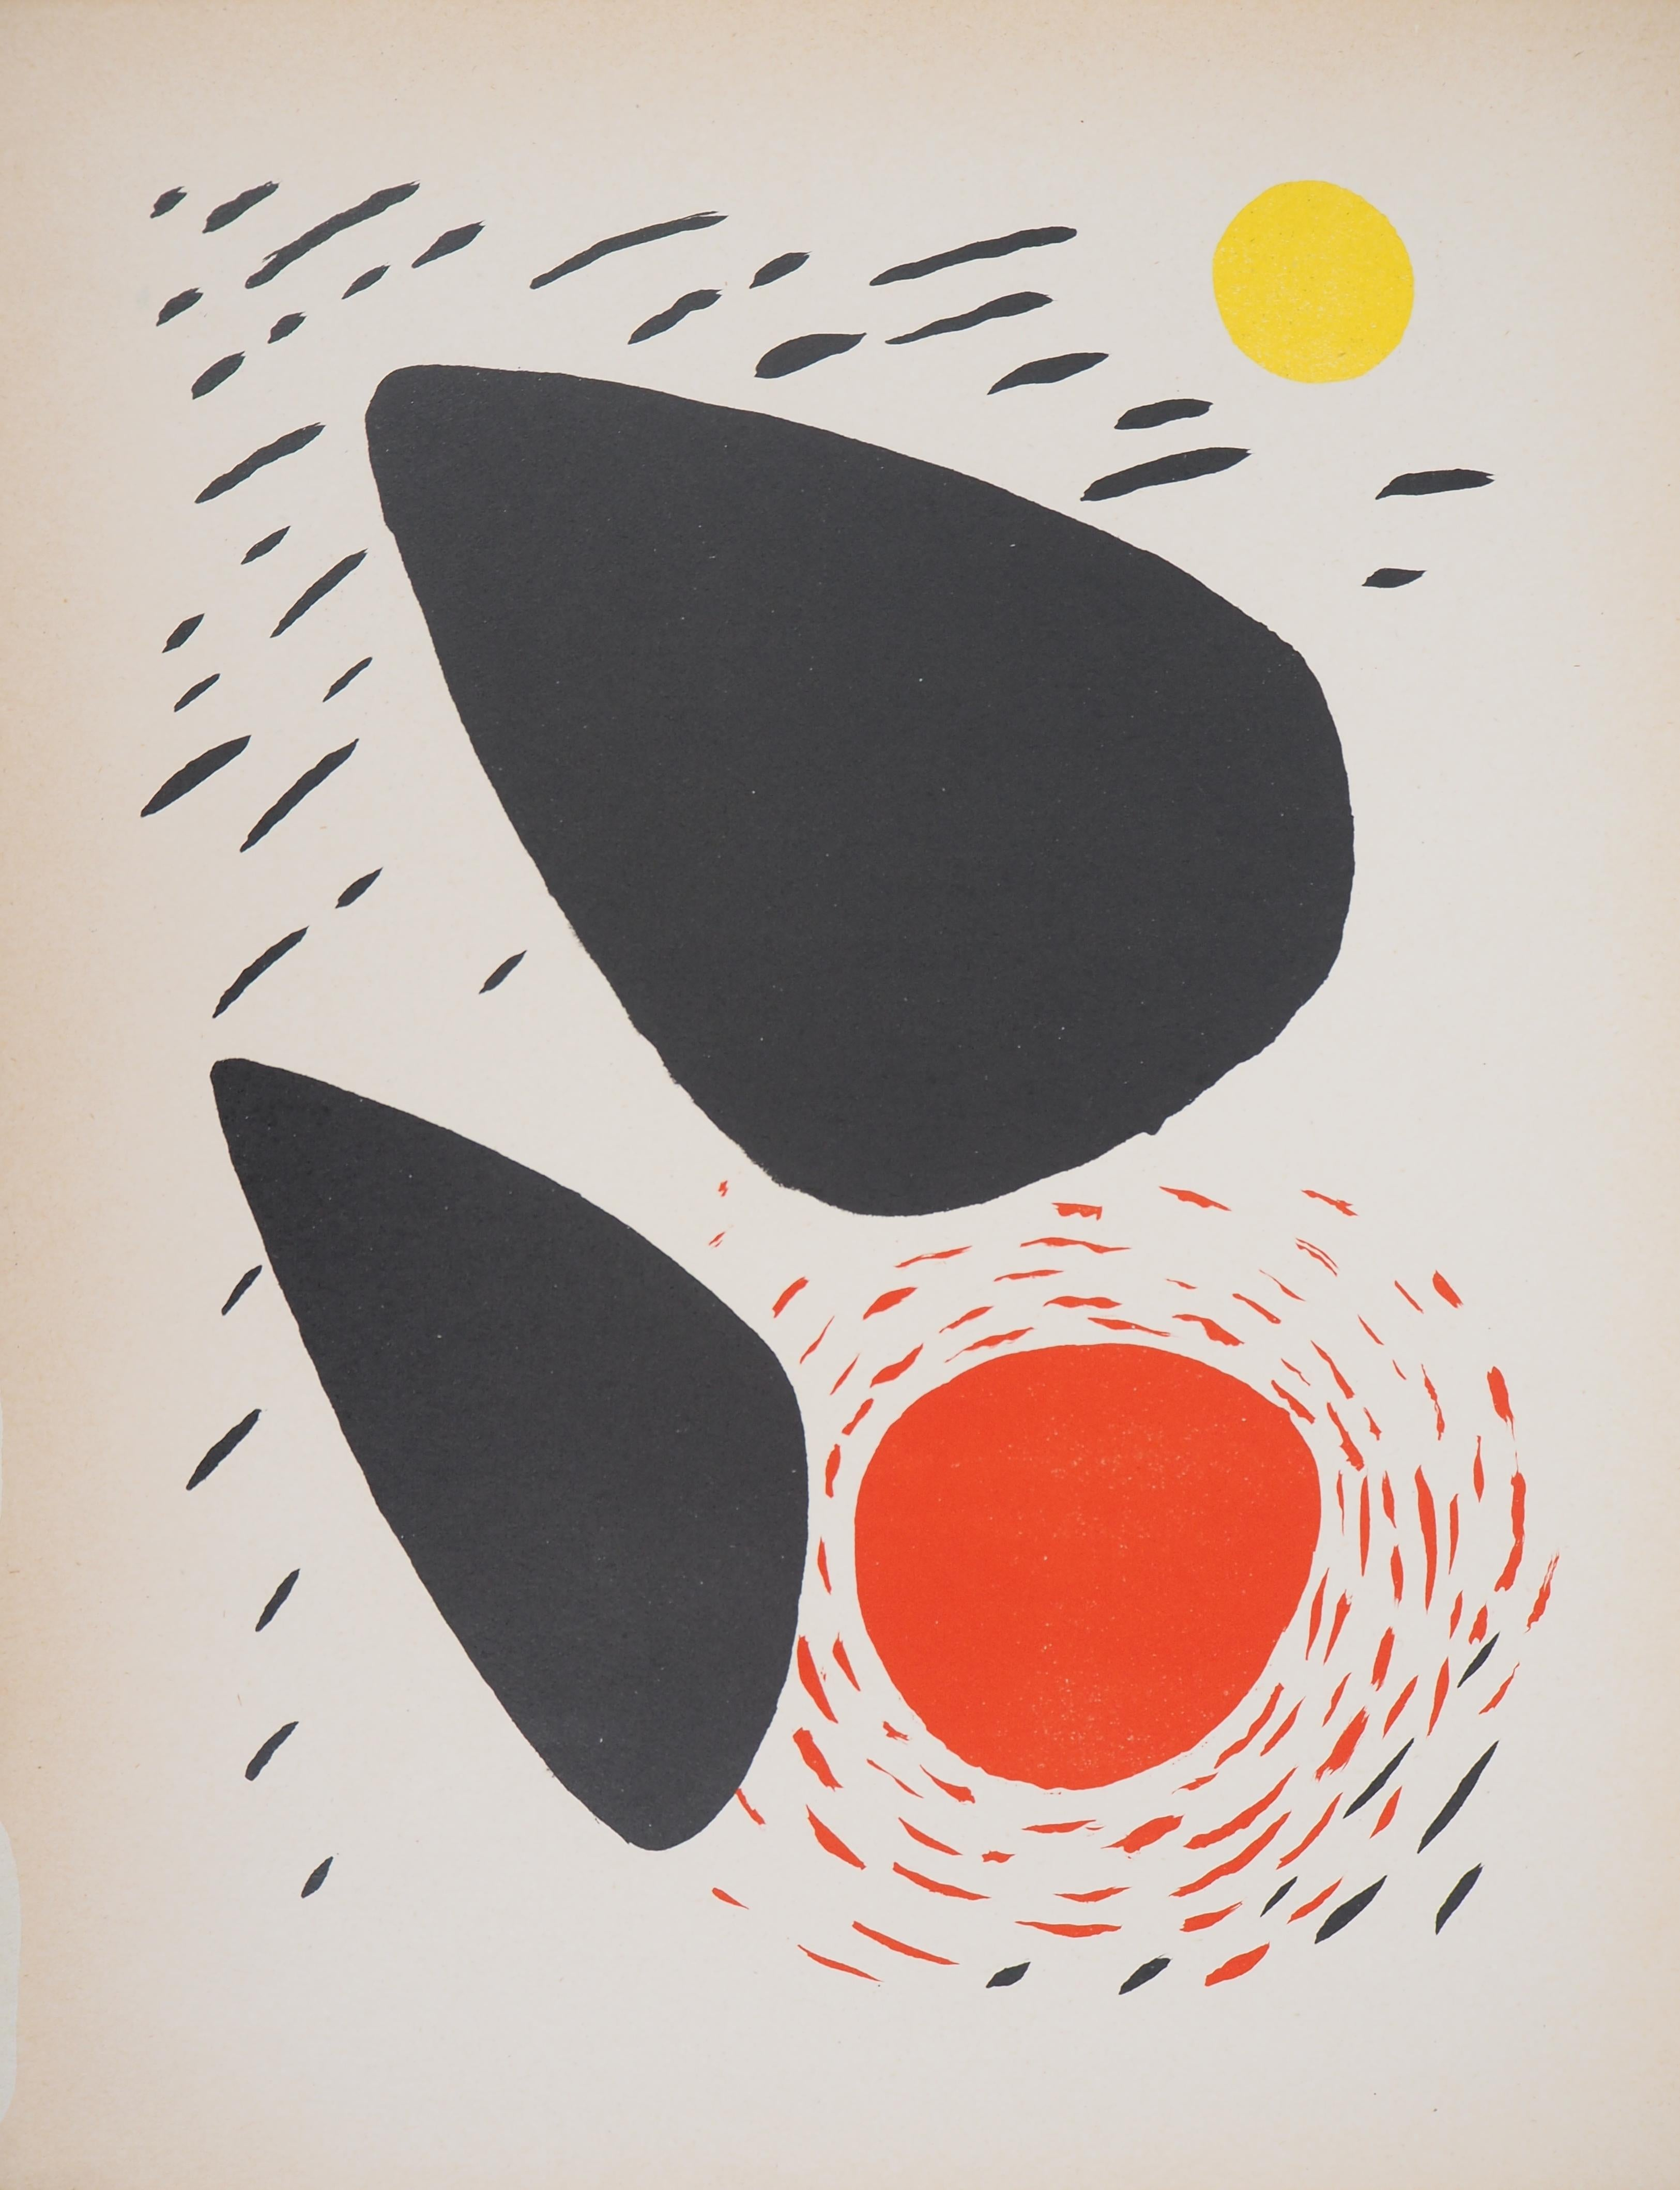 Rocks and Sun - Original lithograph - Mourlot, 1952